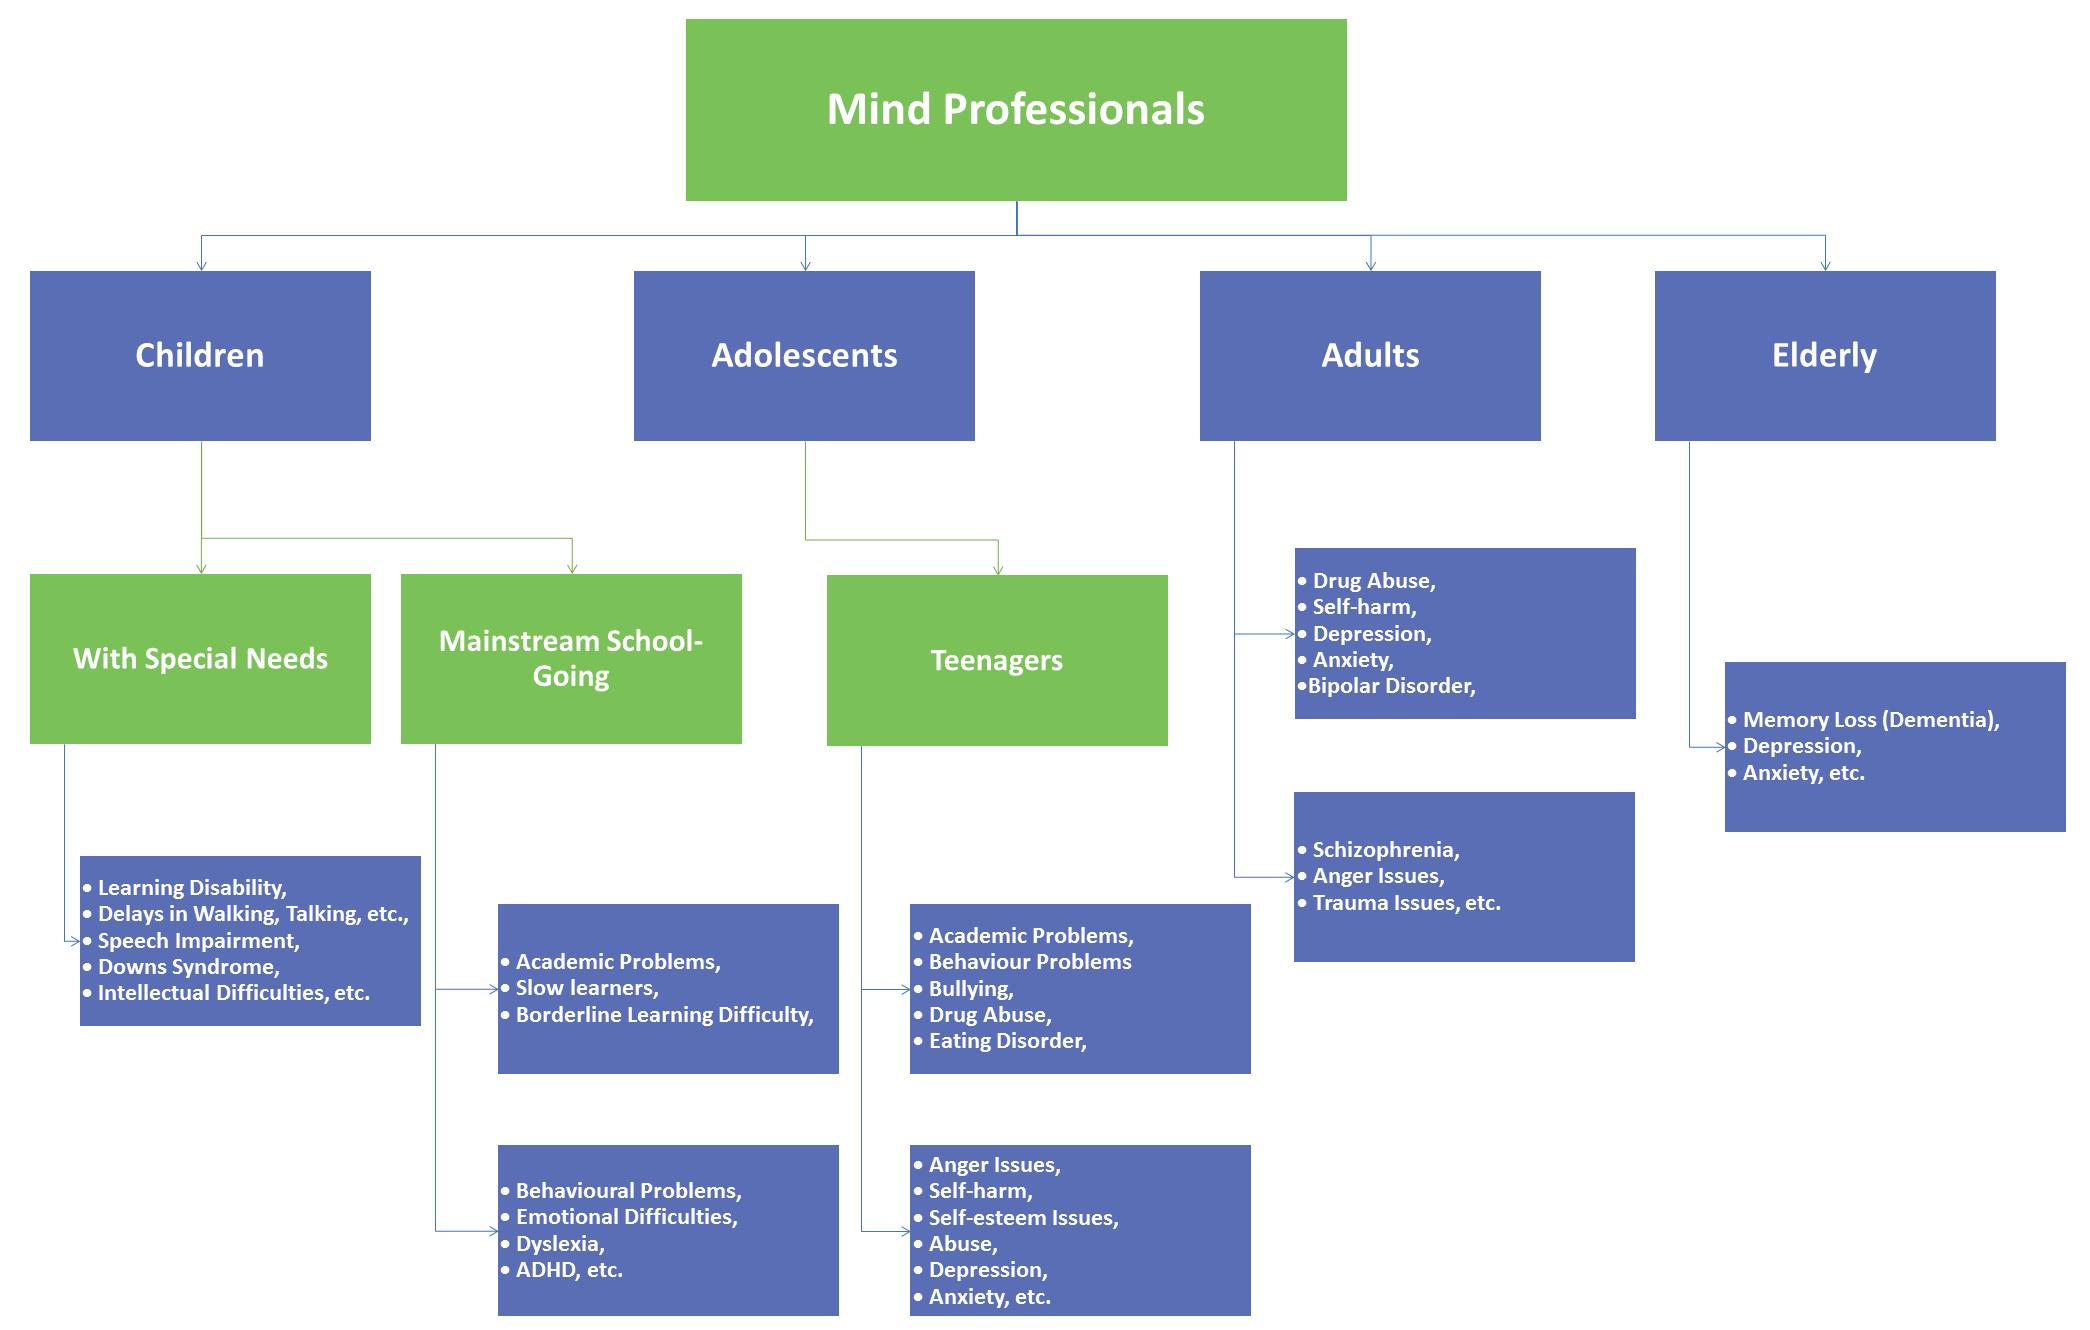 mind professionals services